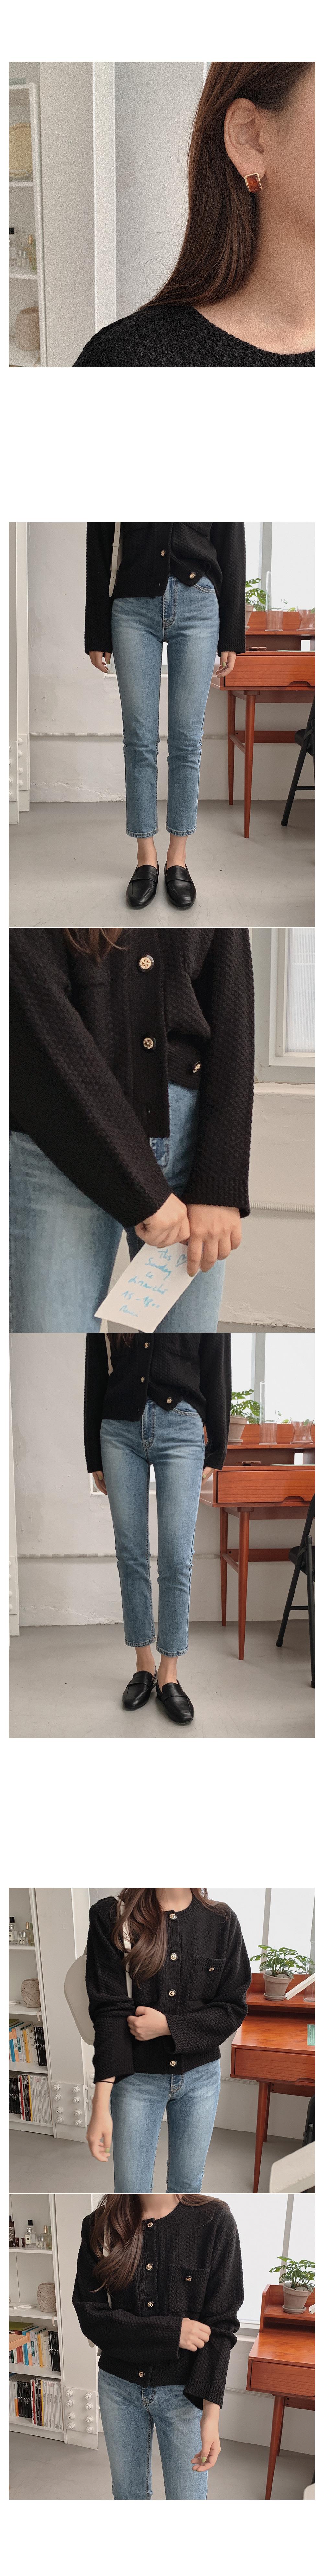 Wiscon button cardigan